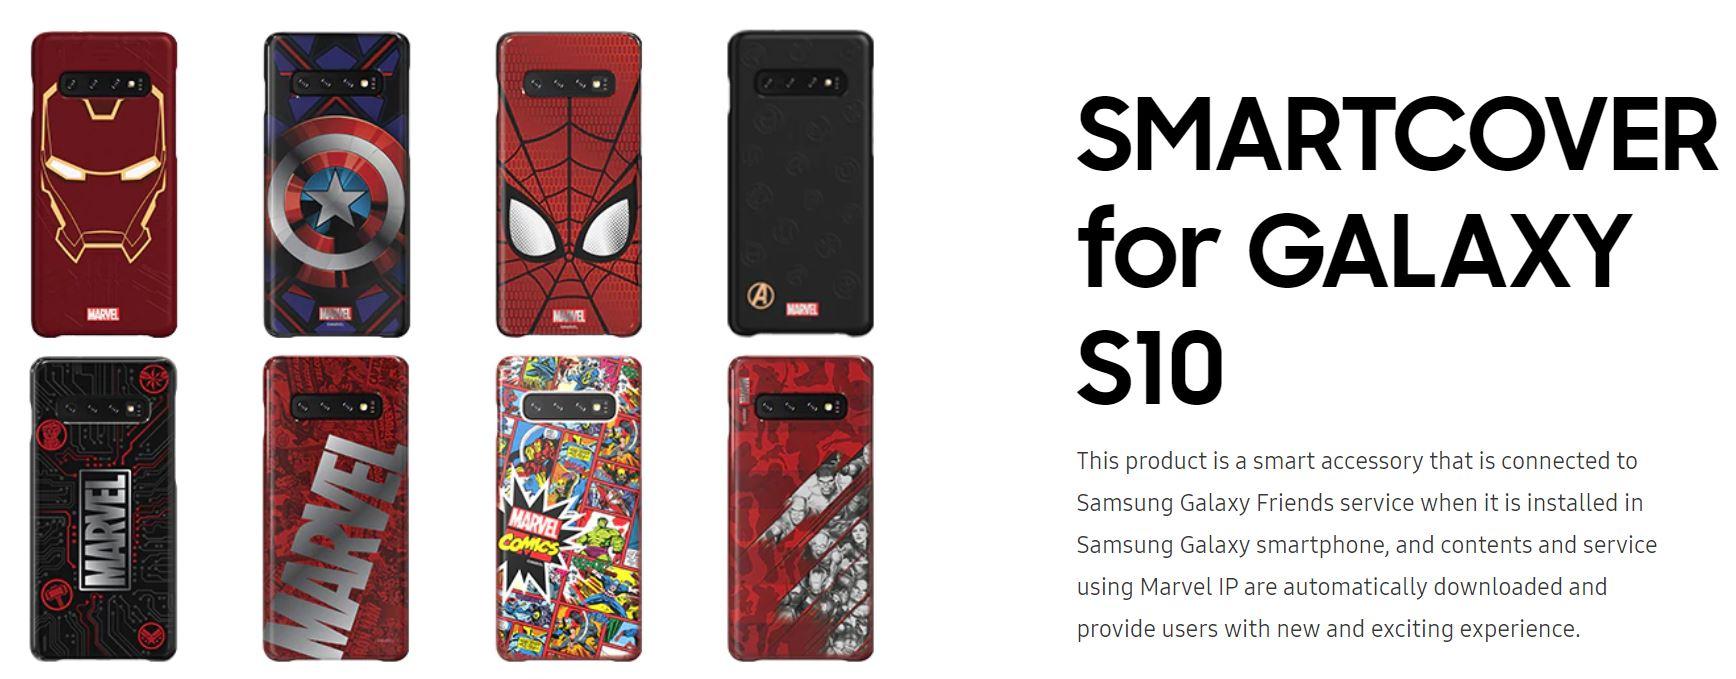 Samsung Galaxy Friend Marvel Smart Covers S10/S10+/S10e